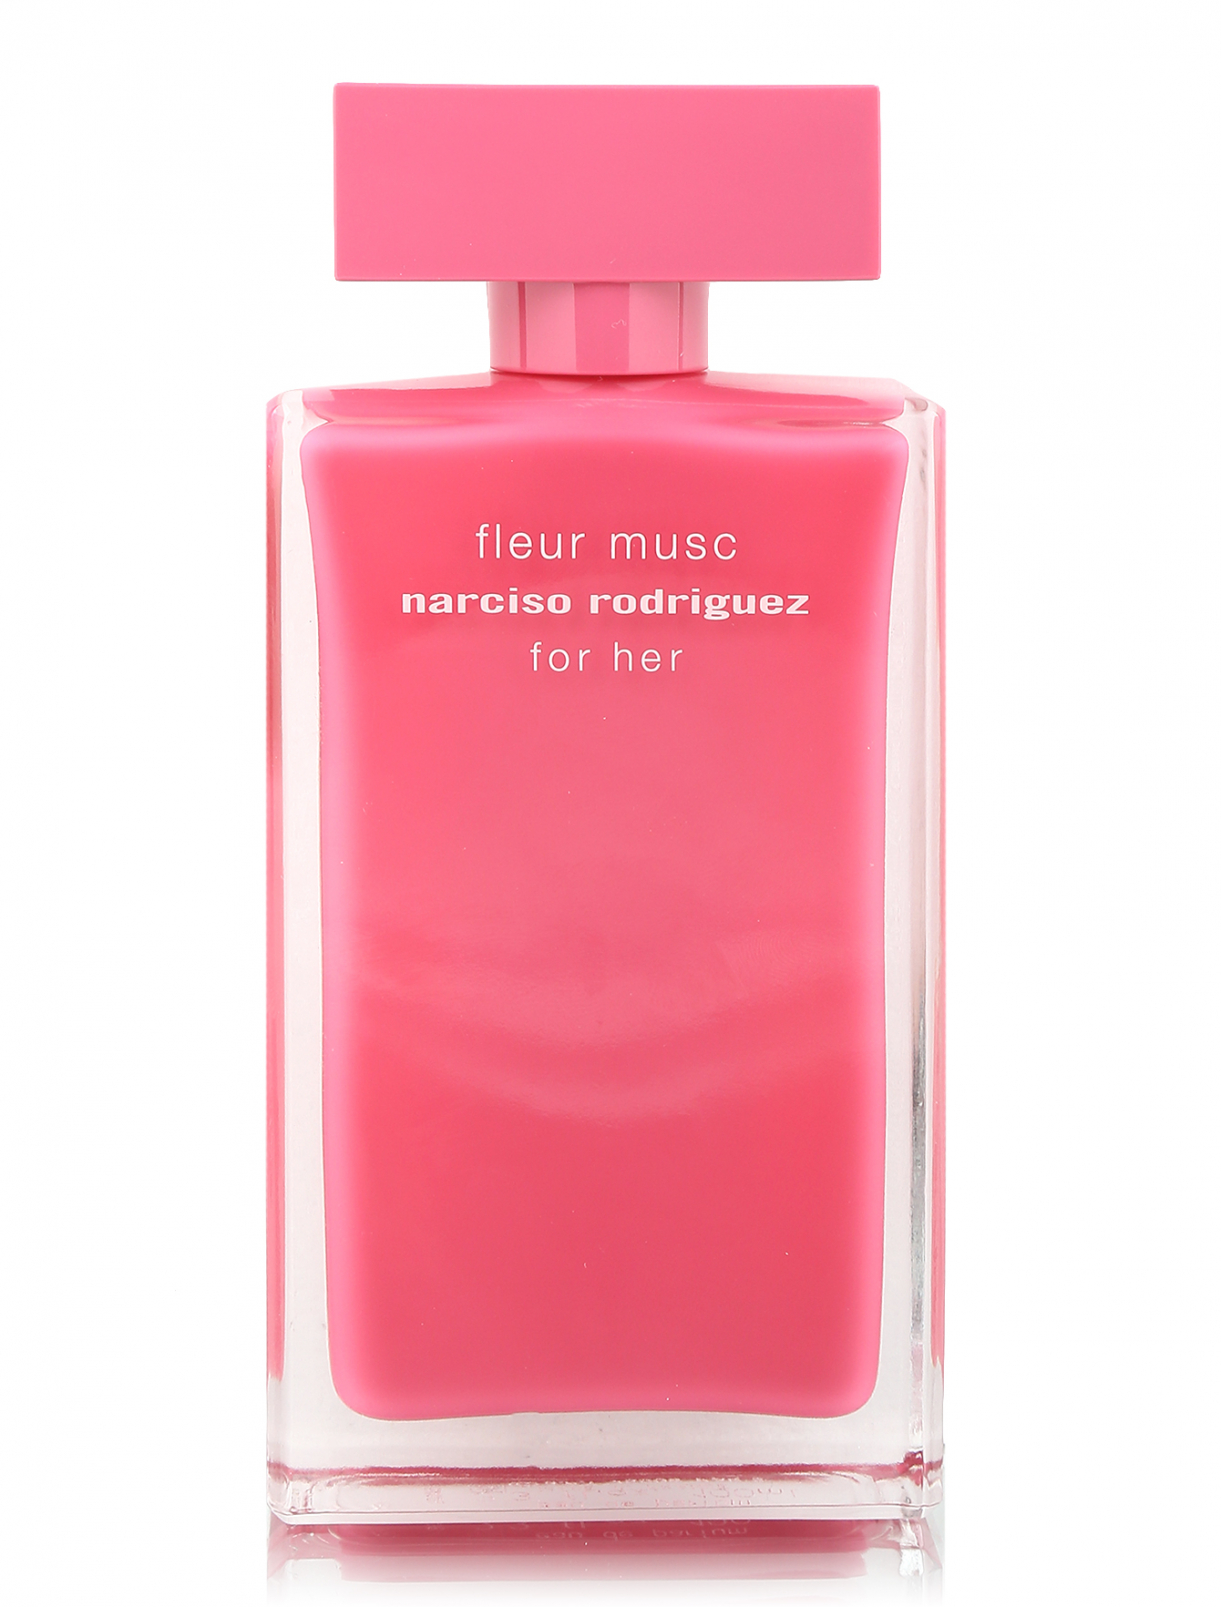 Парфюмерная вода 100 мл Fleur Musc for Her Narciso Rodriguez  –  Общий вид